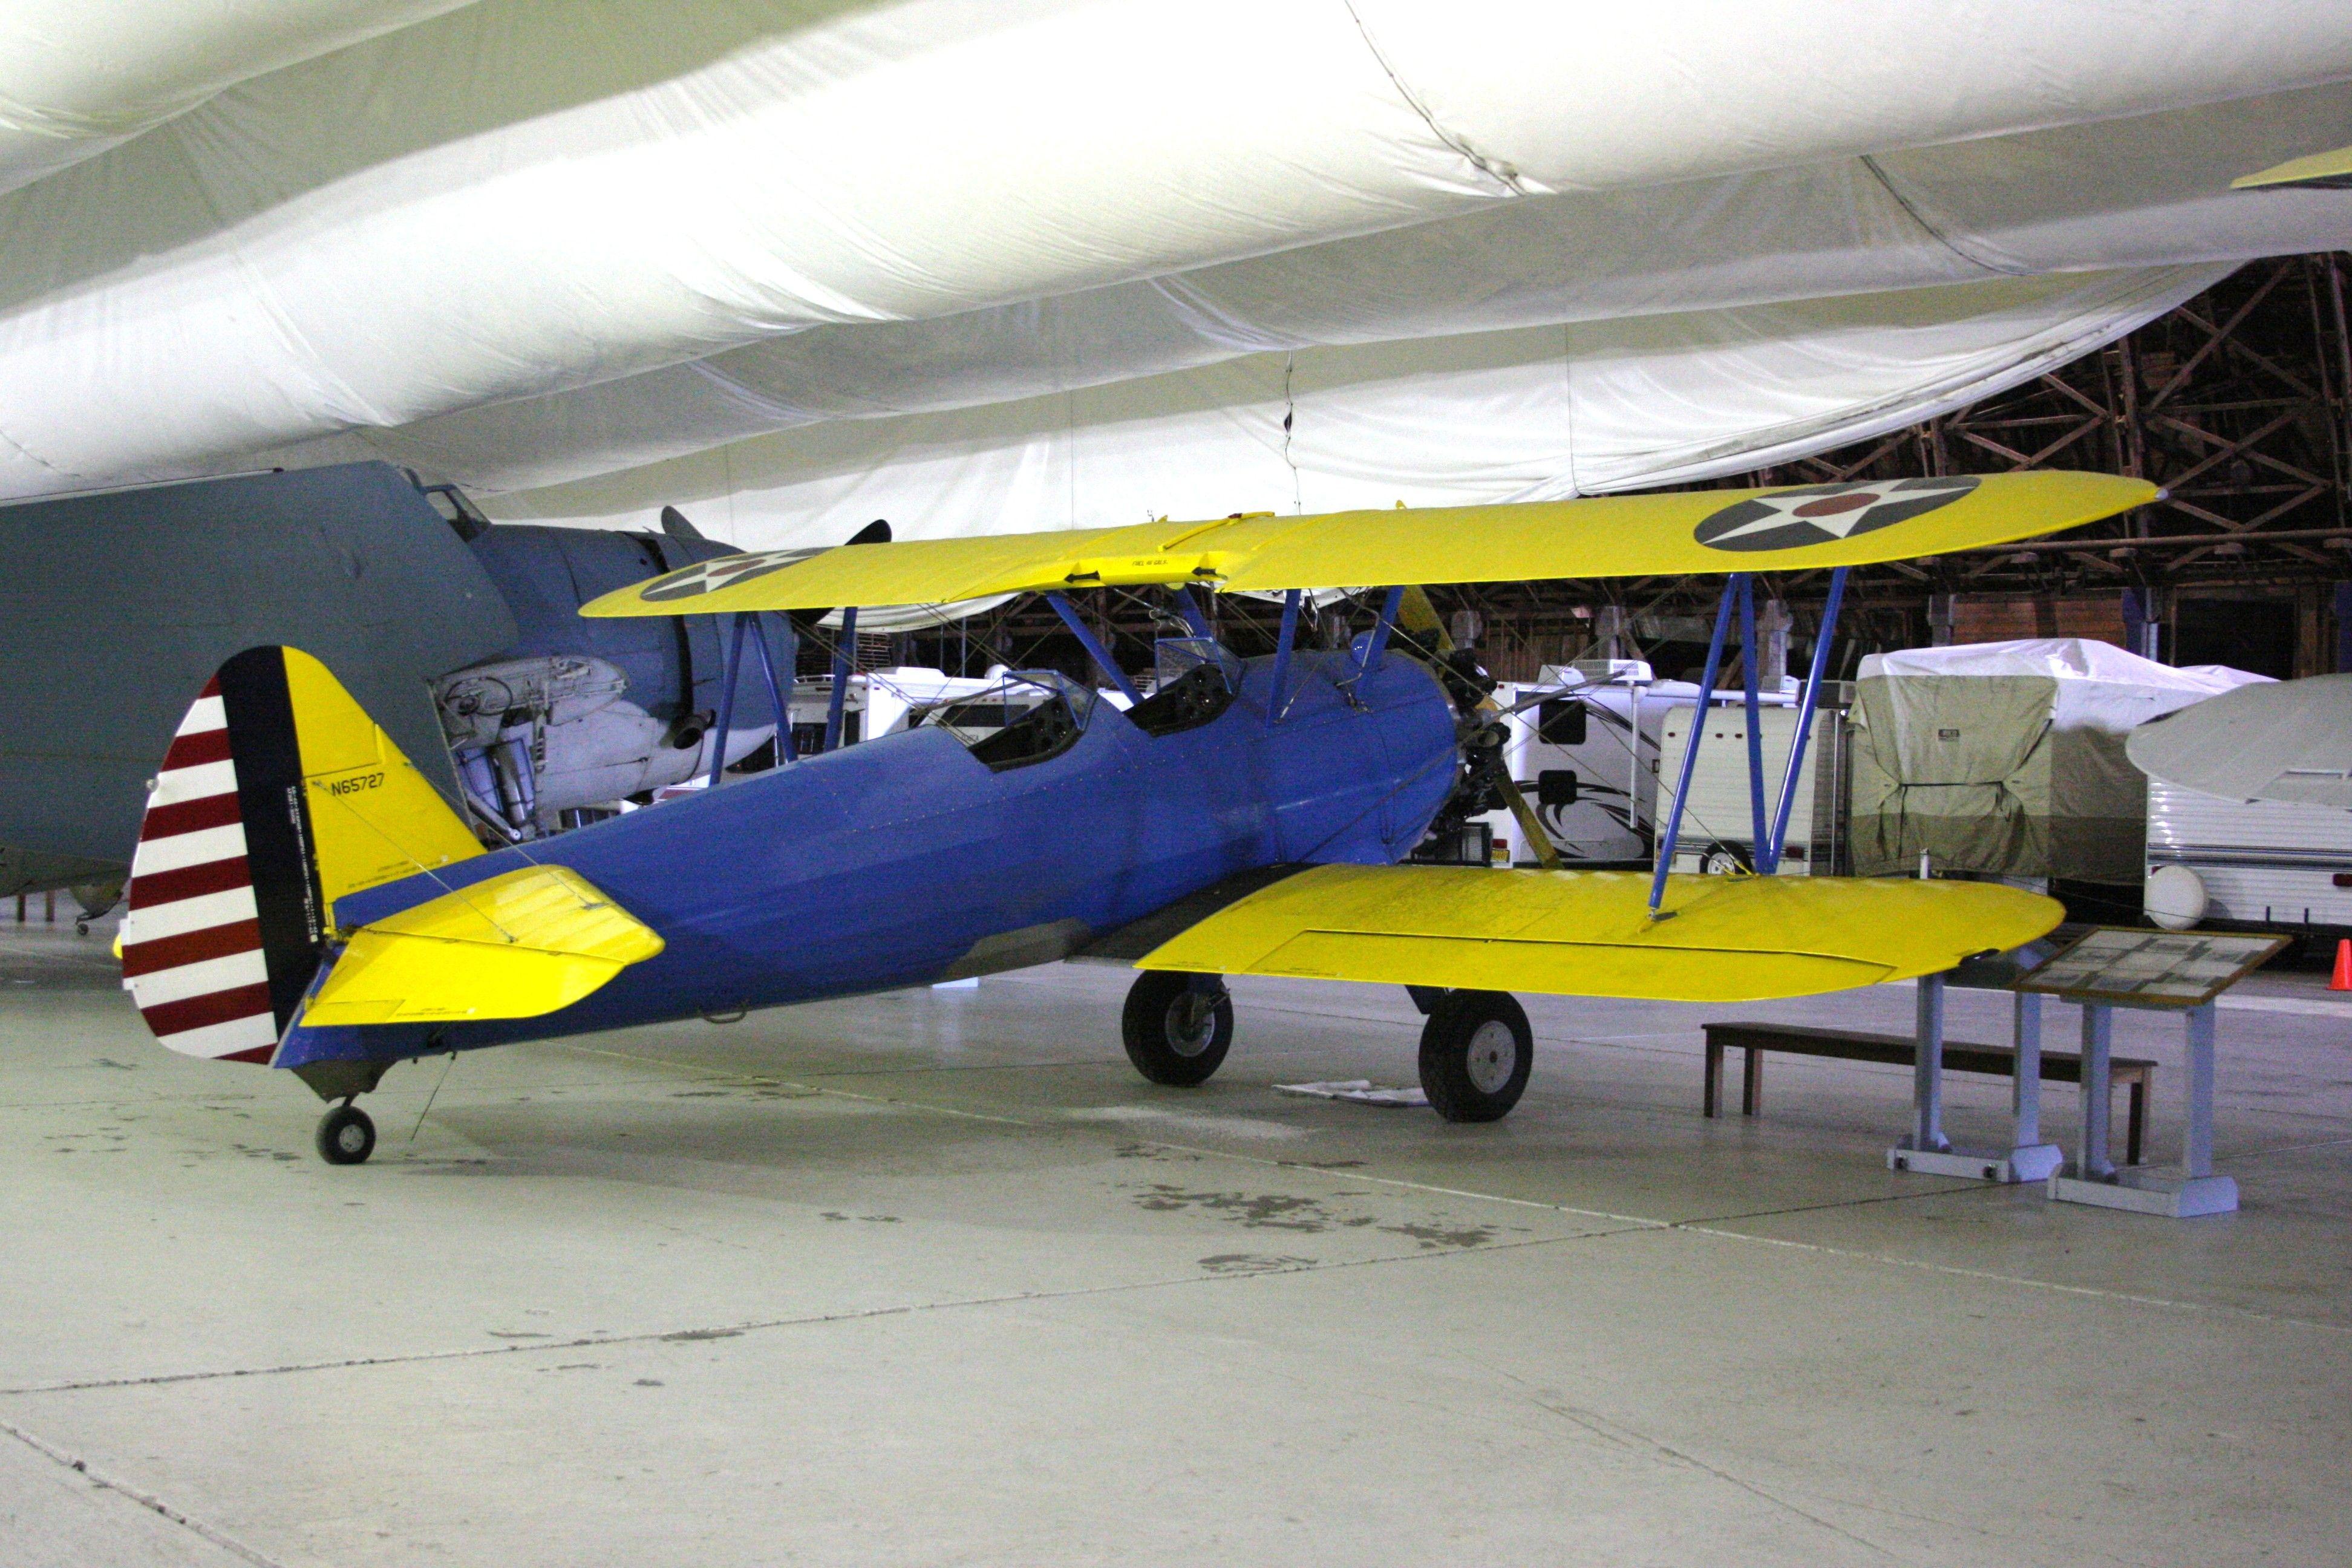 Tilamook Air Museum, OR. 02/2014. Tilamook, Oregon coast